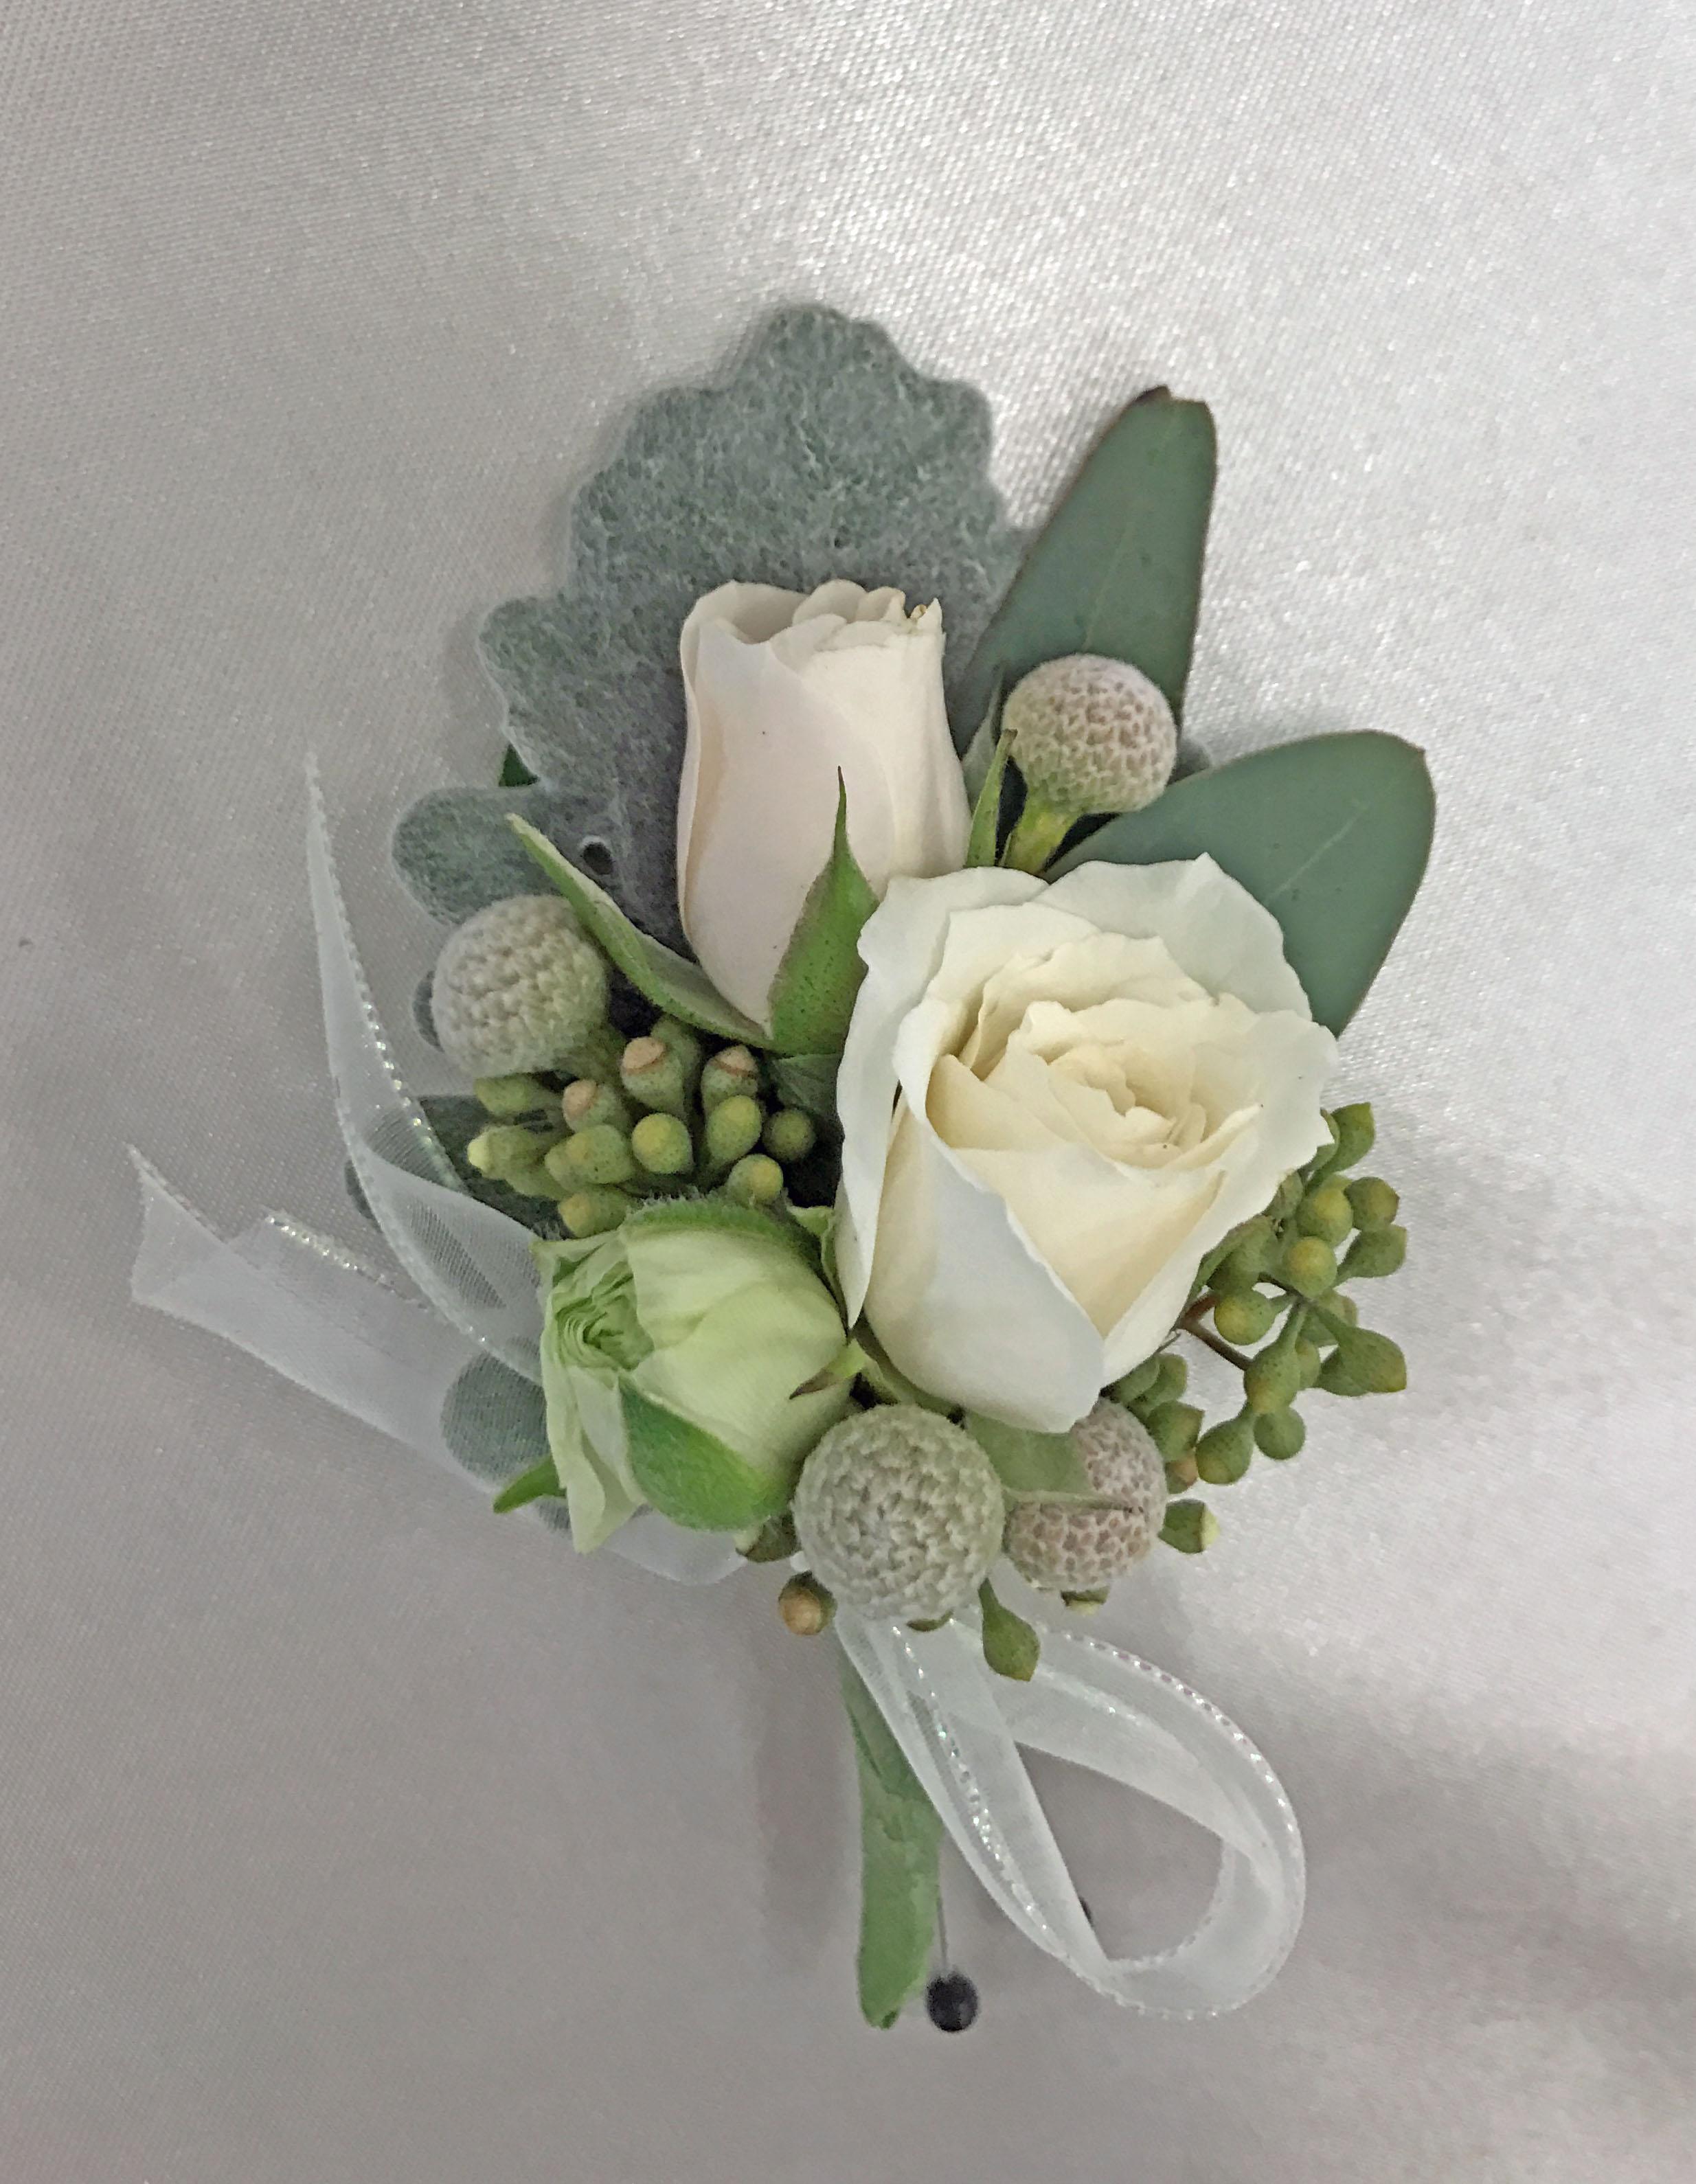 Petal & Bloom Floral Design -Blackfo